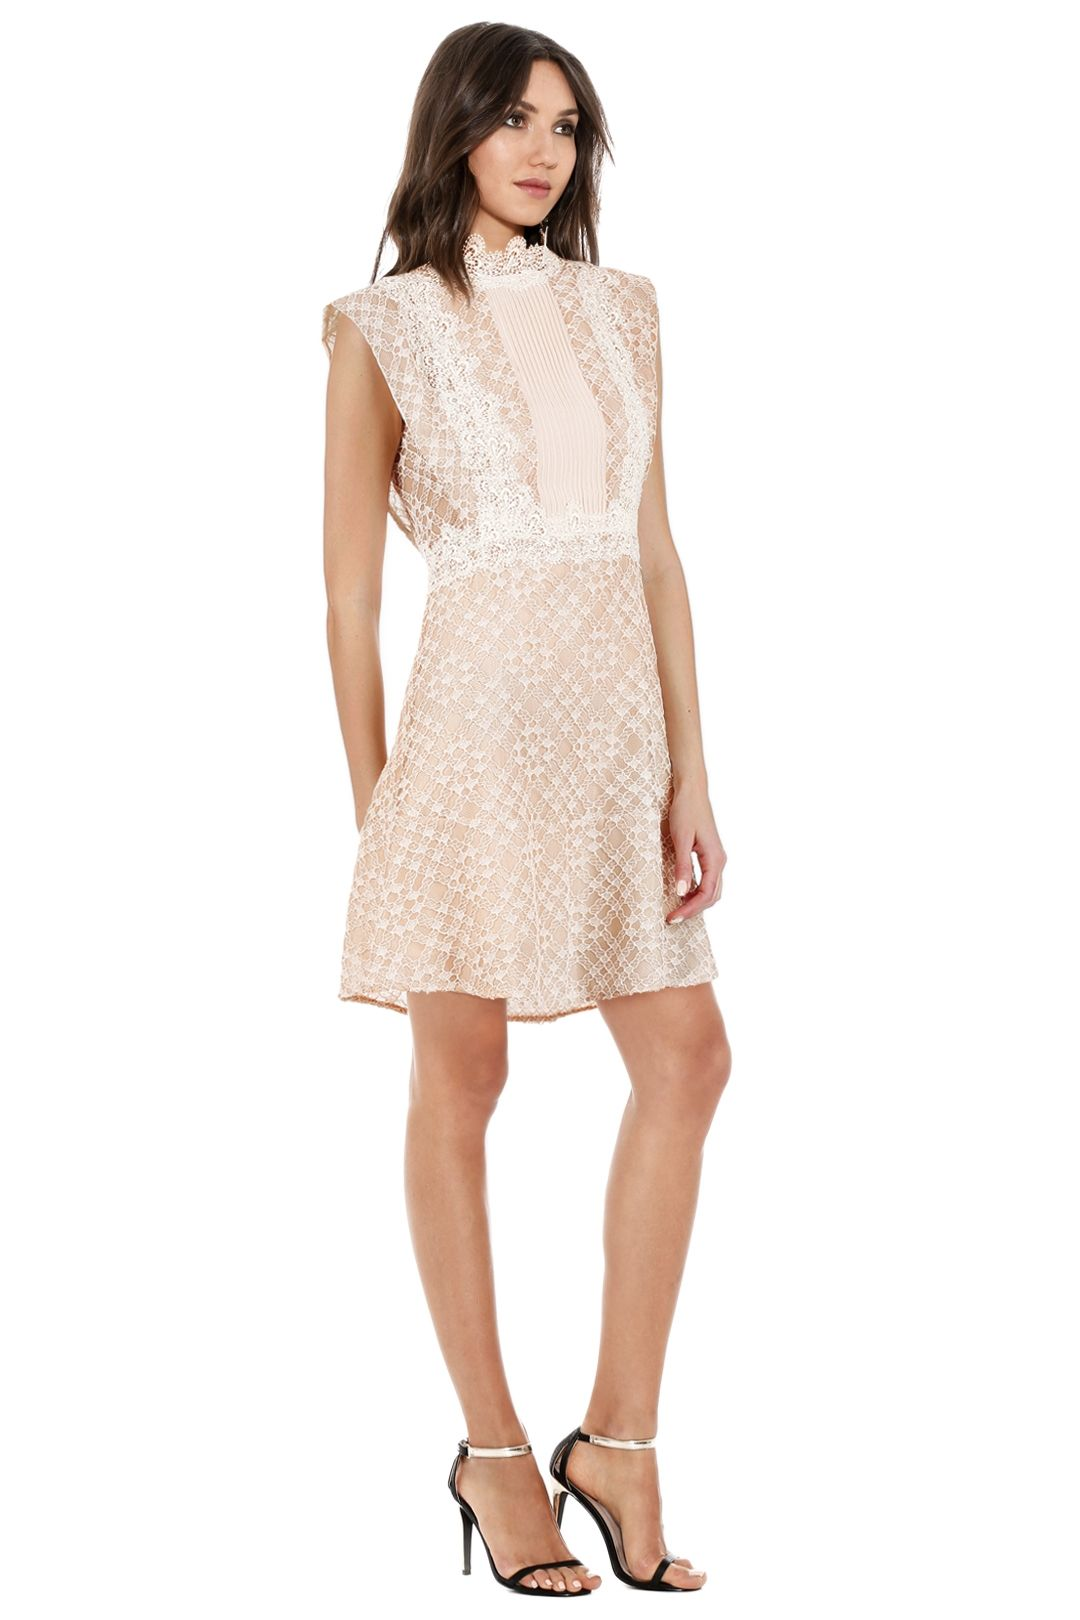 Sandro - Peaches Lace Dress - Cream - Side